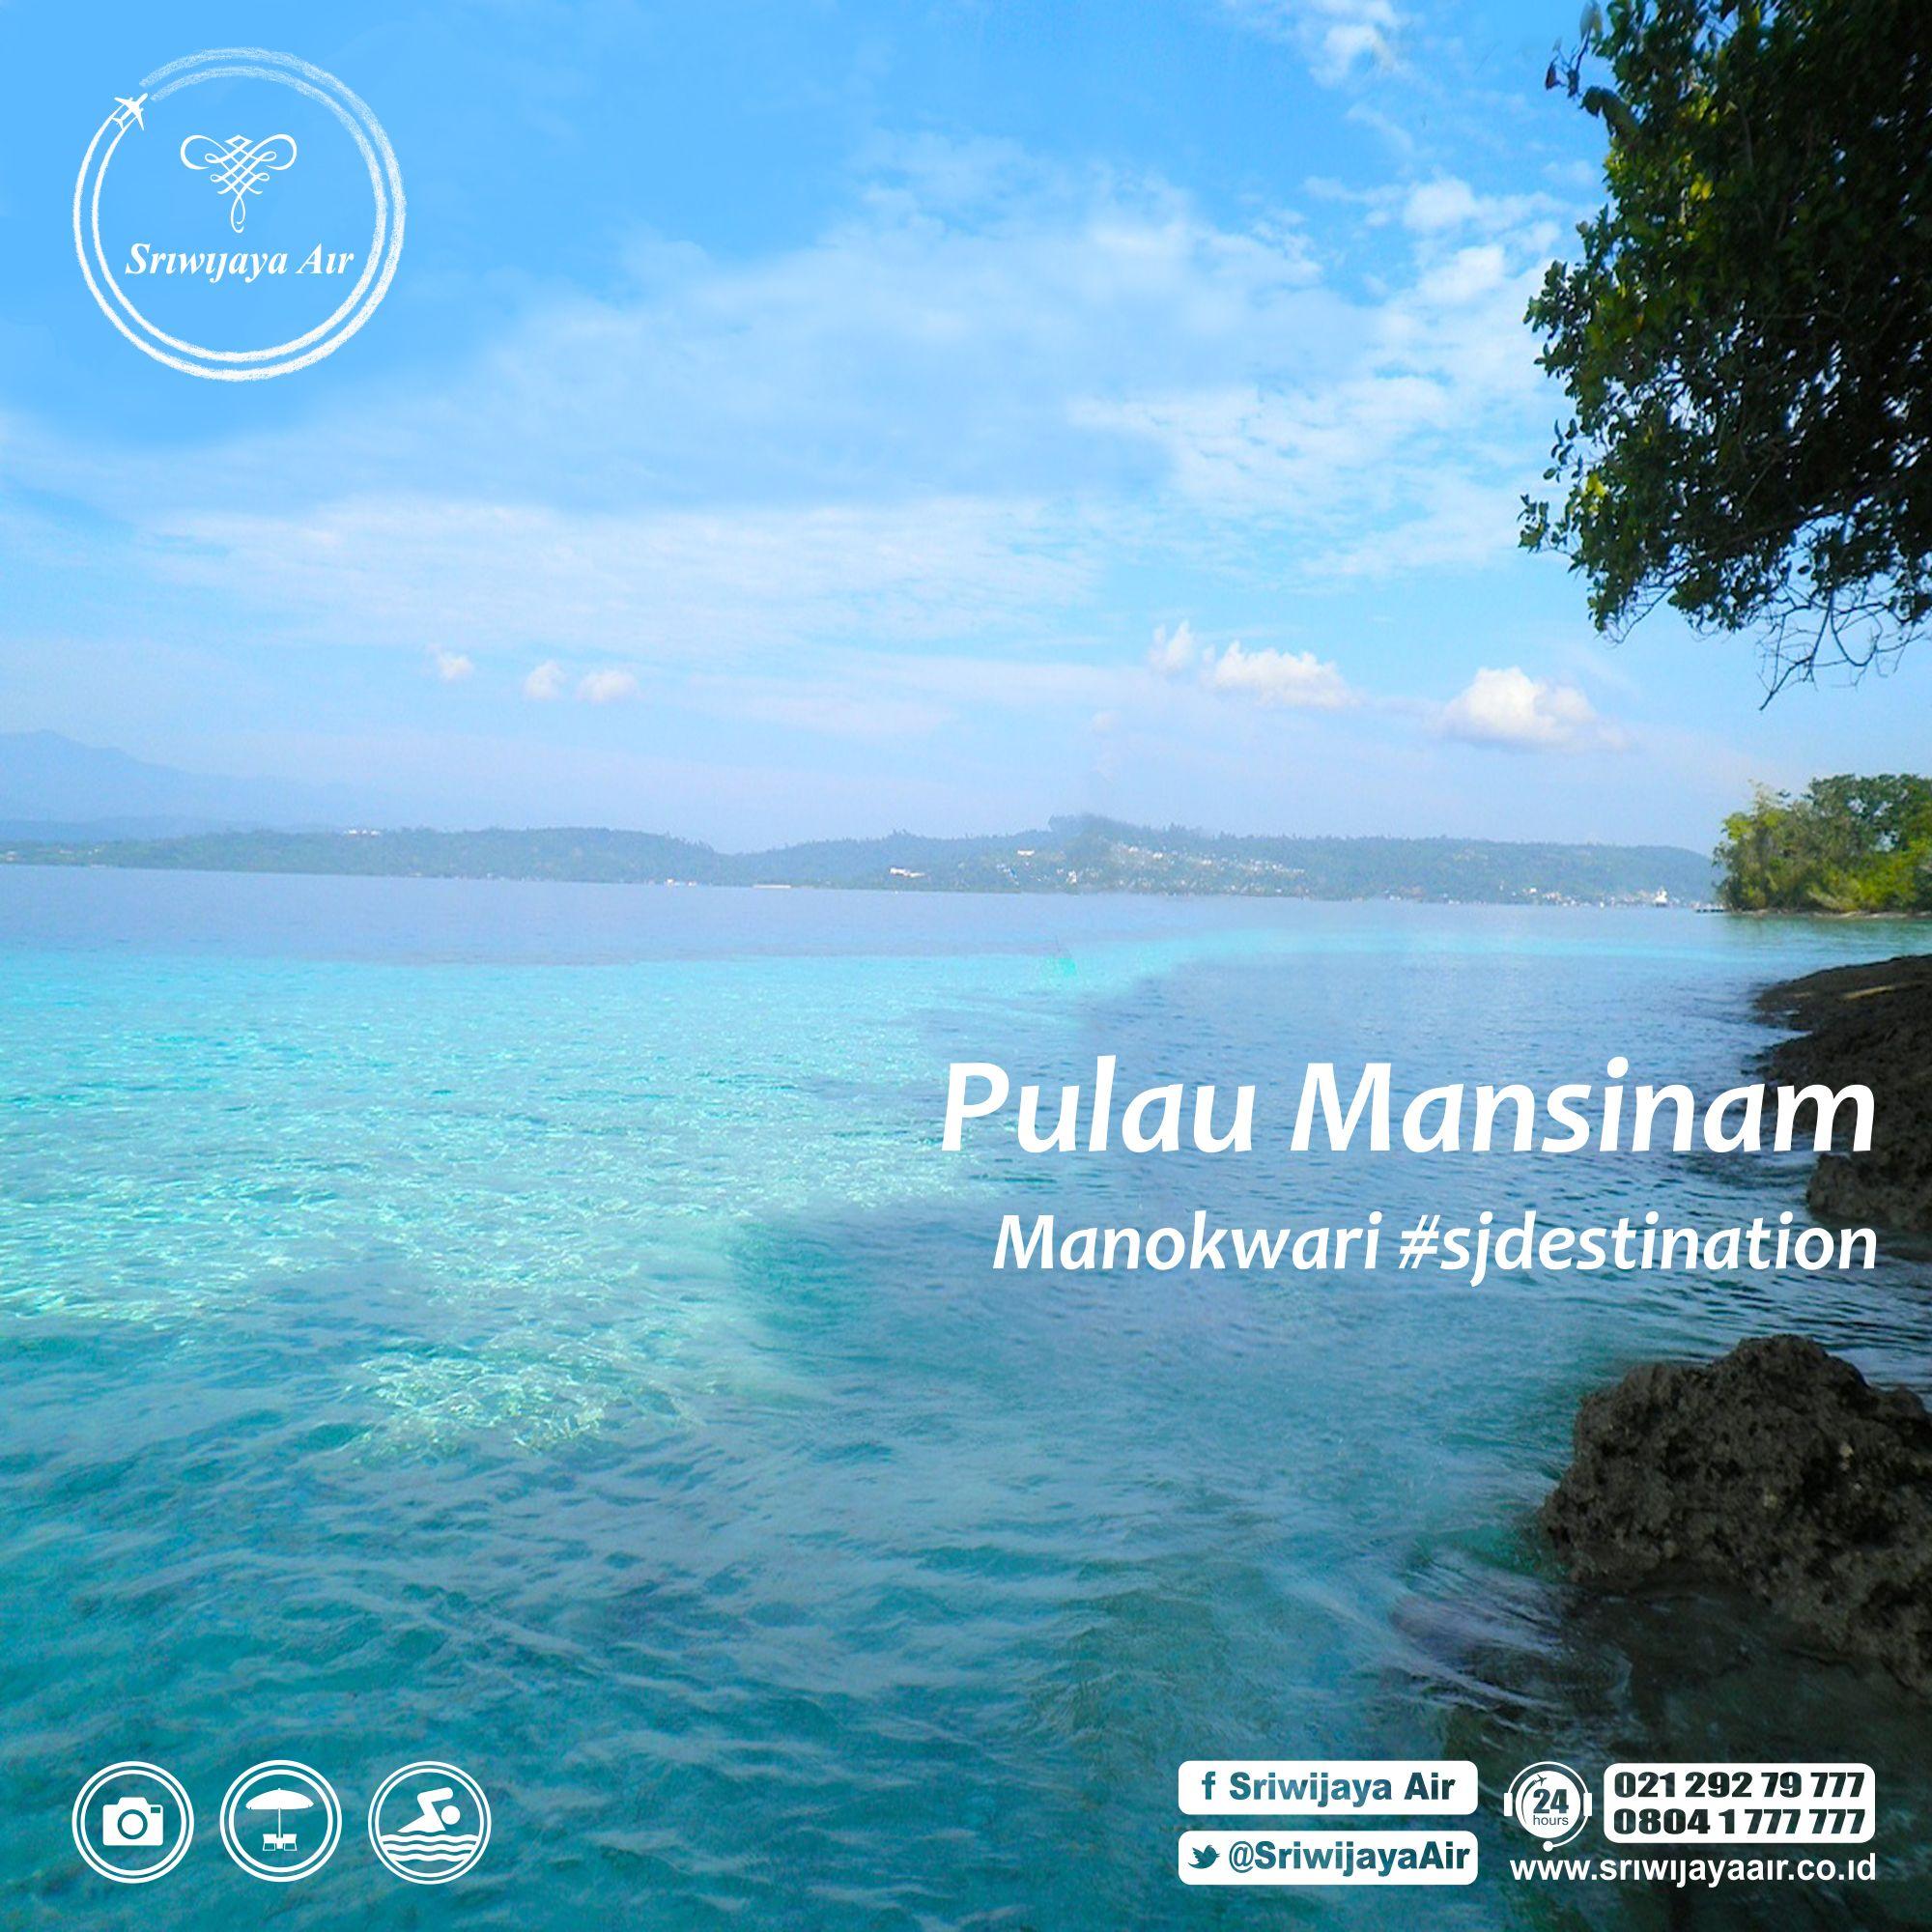 Wisata Rohani Manokwari Yuk Silahkan Kunjungi Pulau Mansinam Partners Mengunjungi